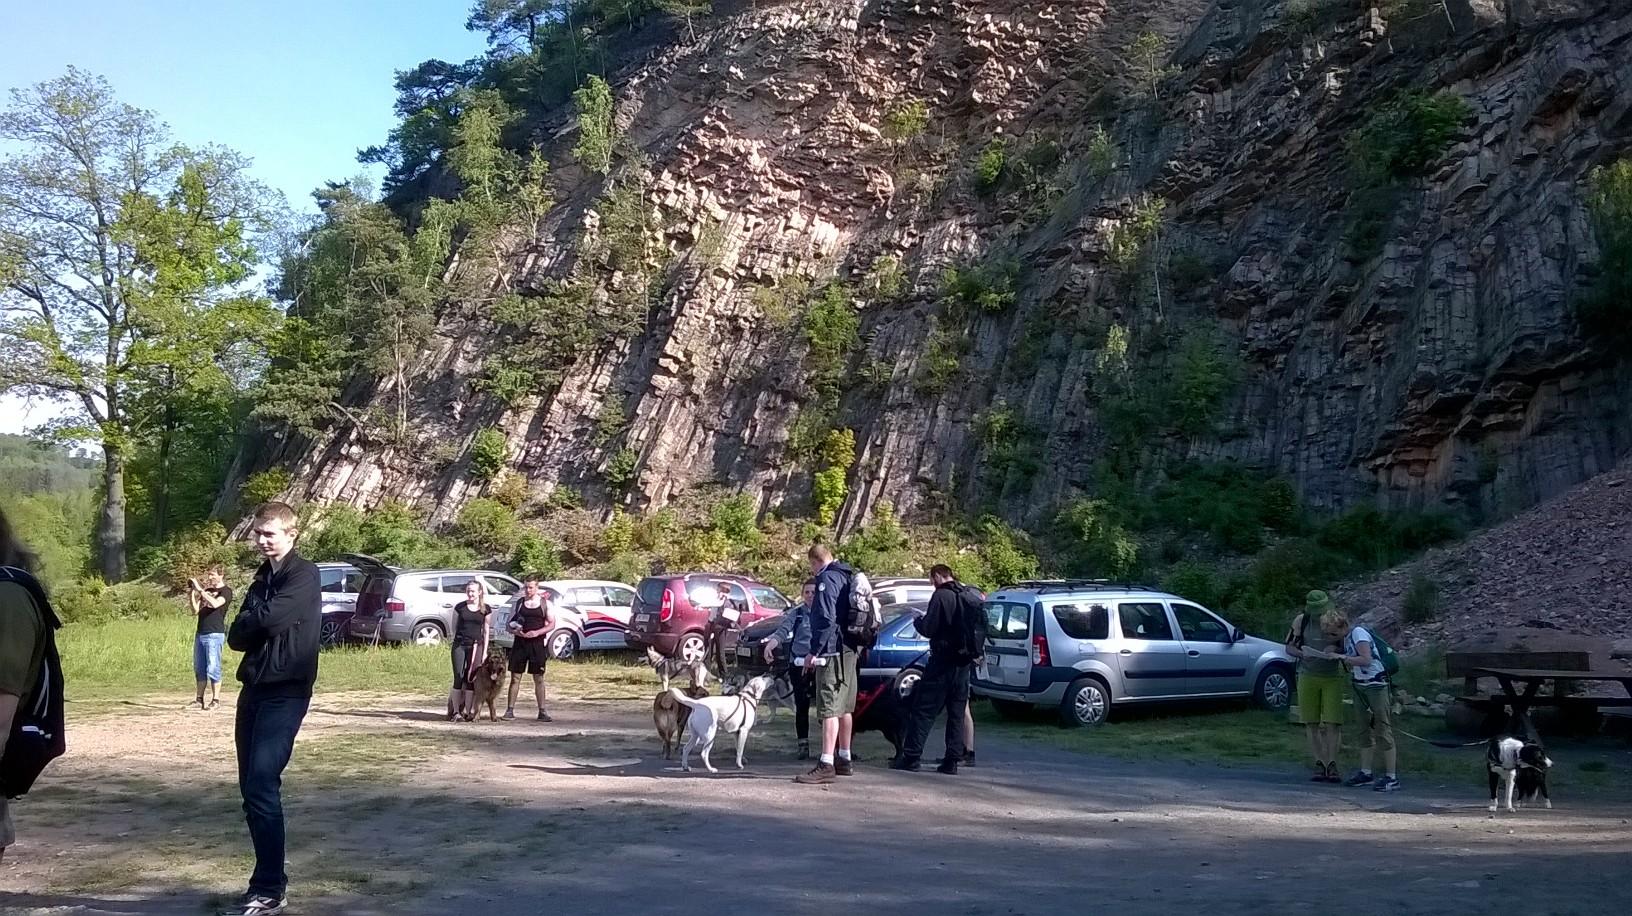 noclegi z psem w górach